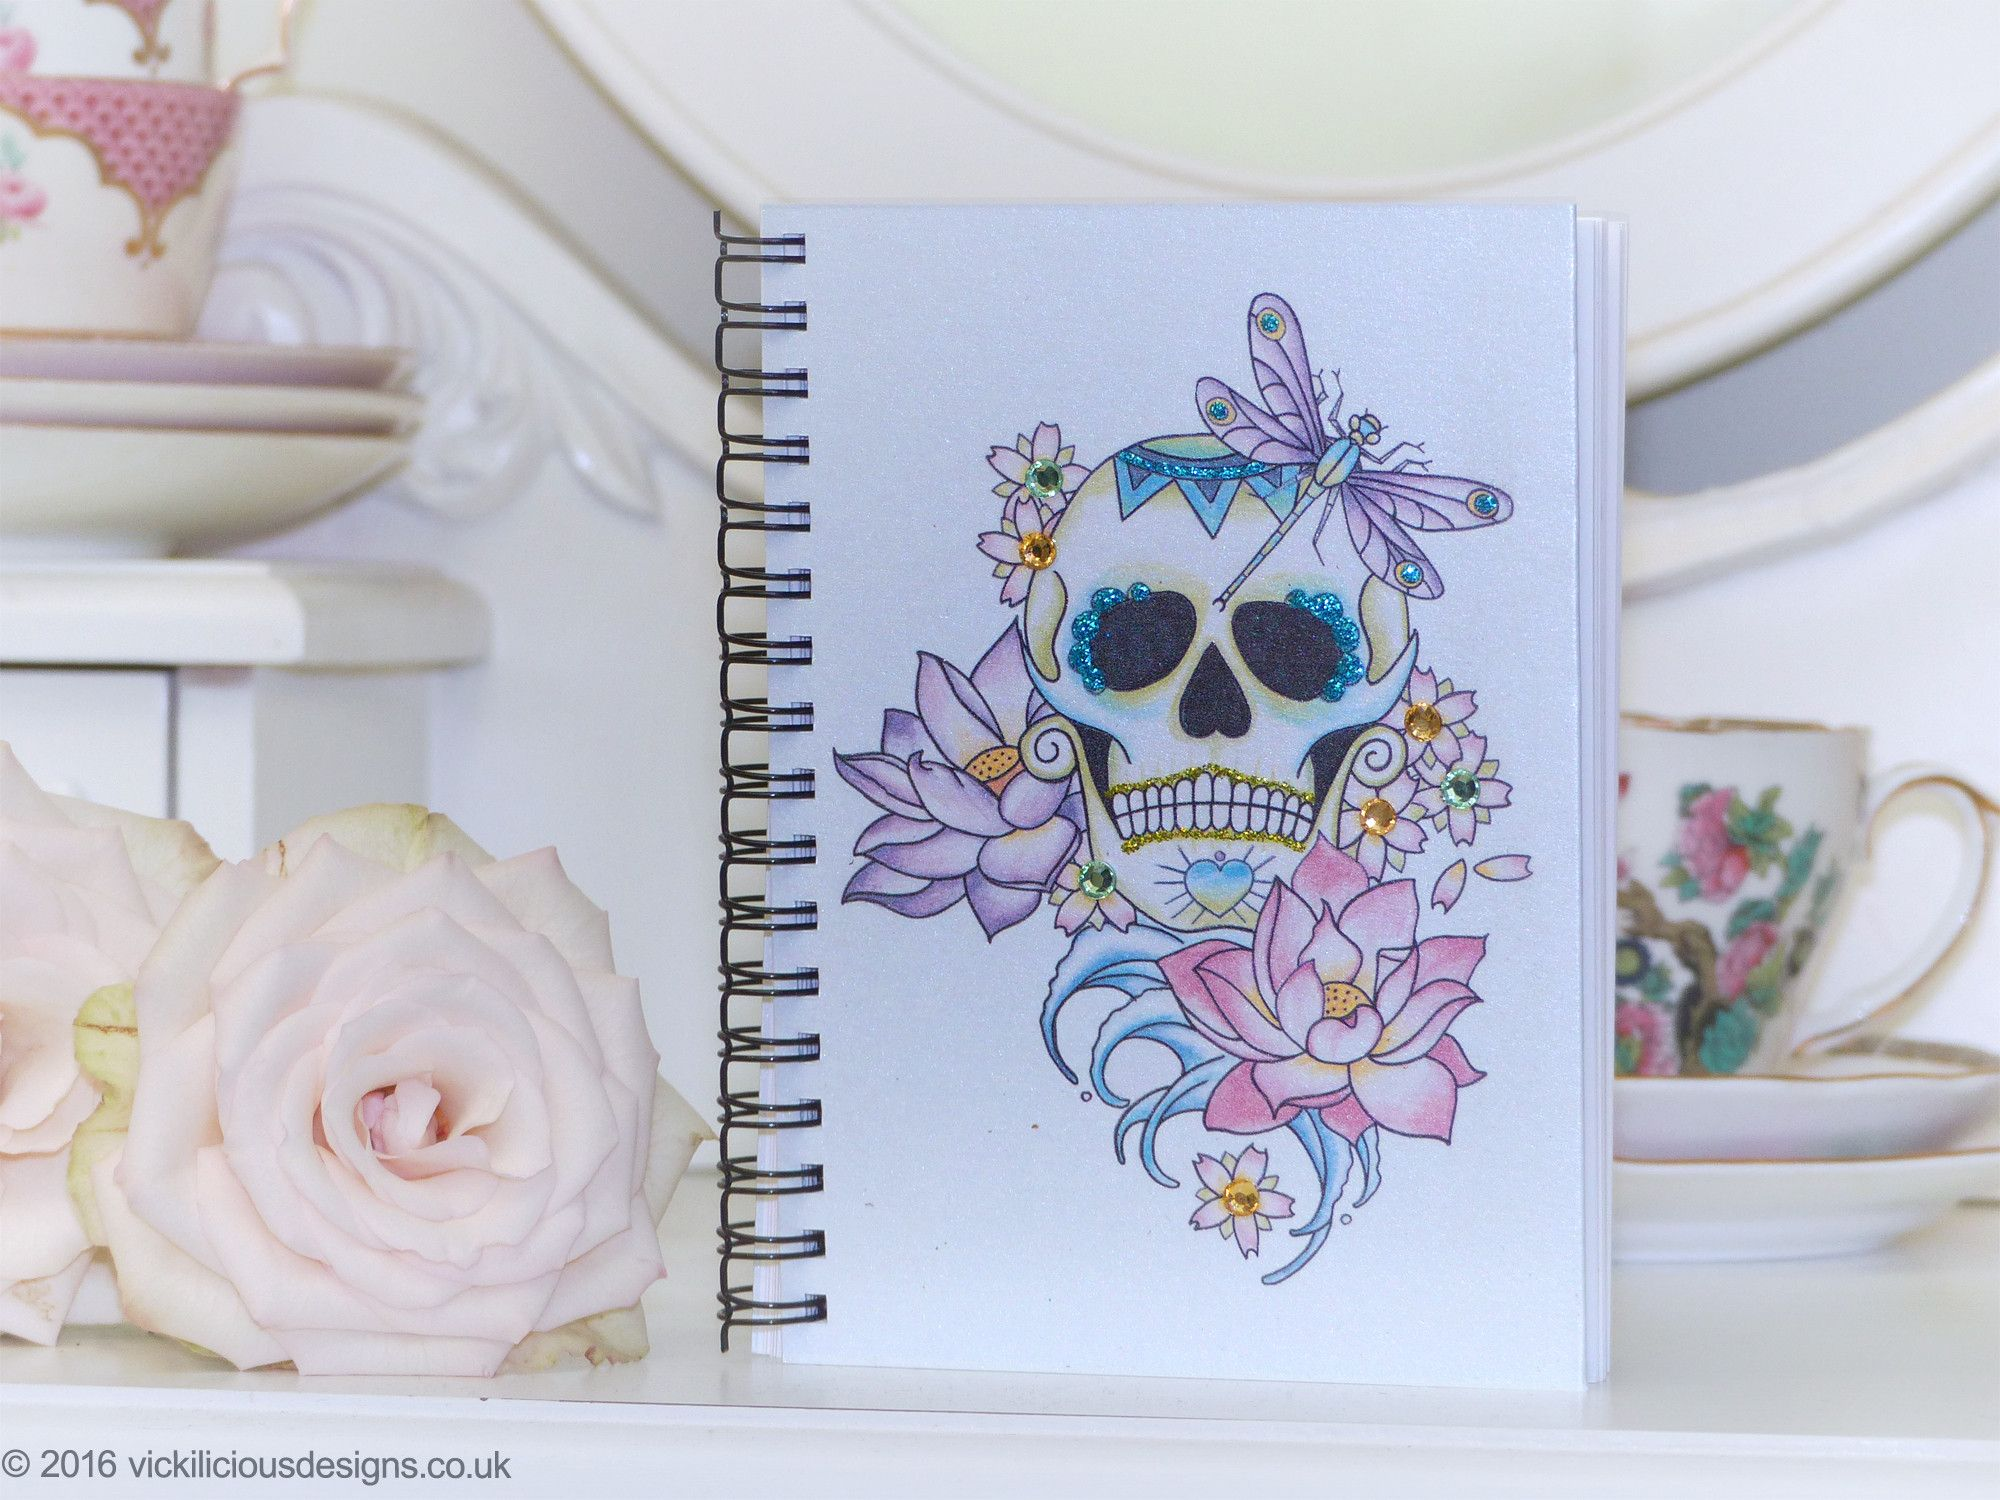 Lotus flower sugar skull tattoo day of the dead handmade a6 notebook lotus flower sugar skull tattoo day of the dead handmade a6 notebook izmirmasajfo